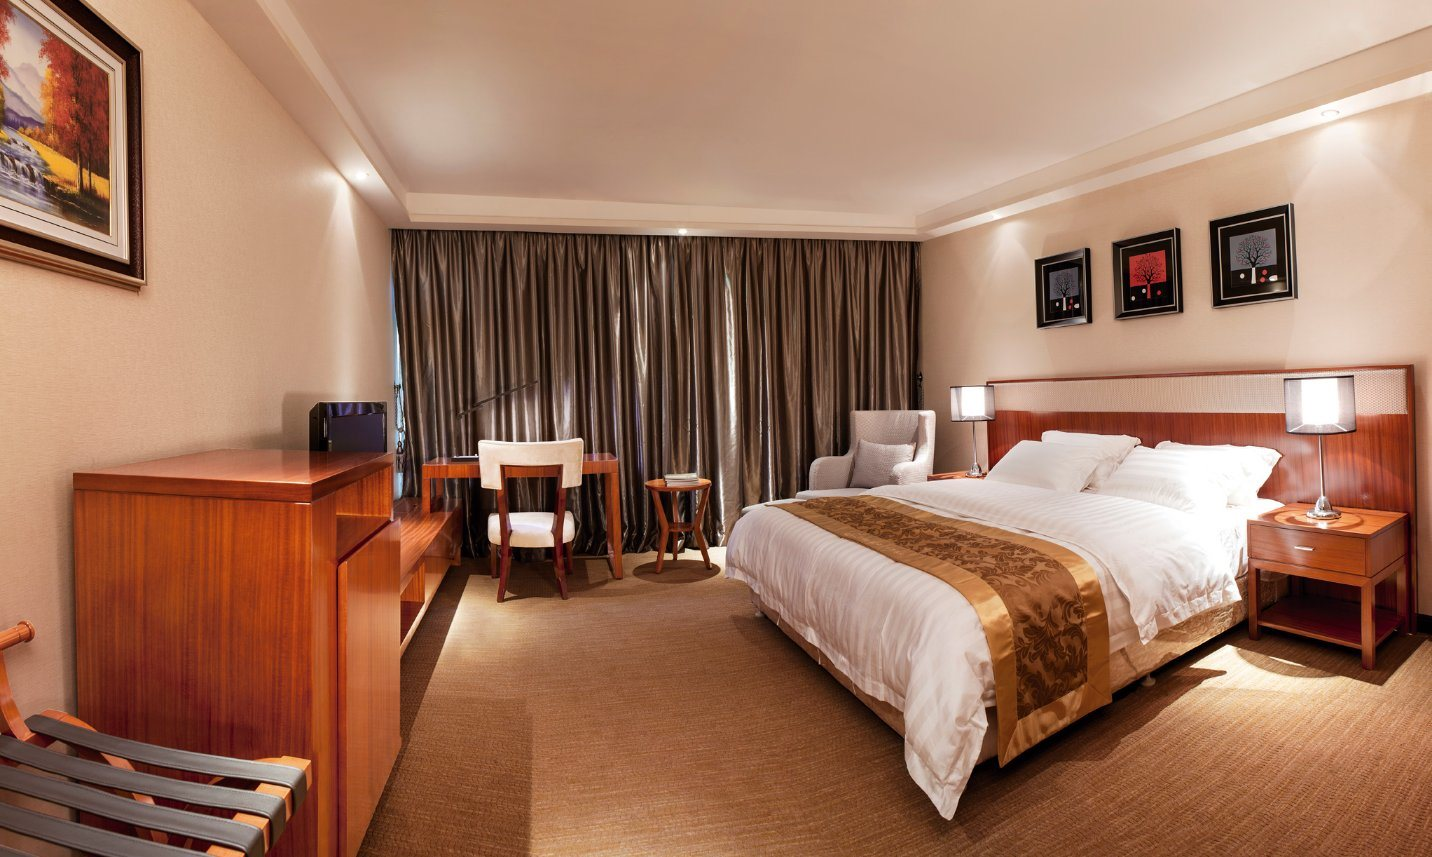 Modern High Quality Hotel Bedroom Furniture (NL-TF208)